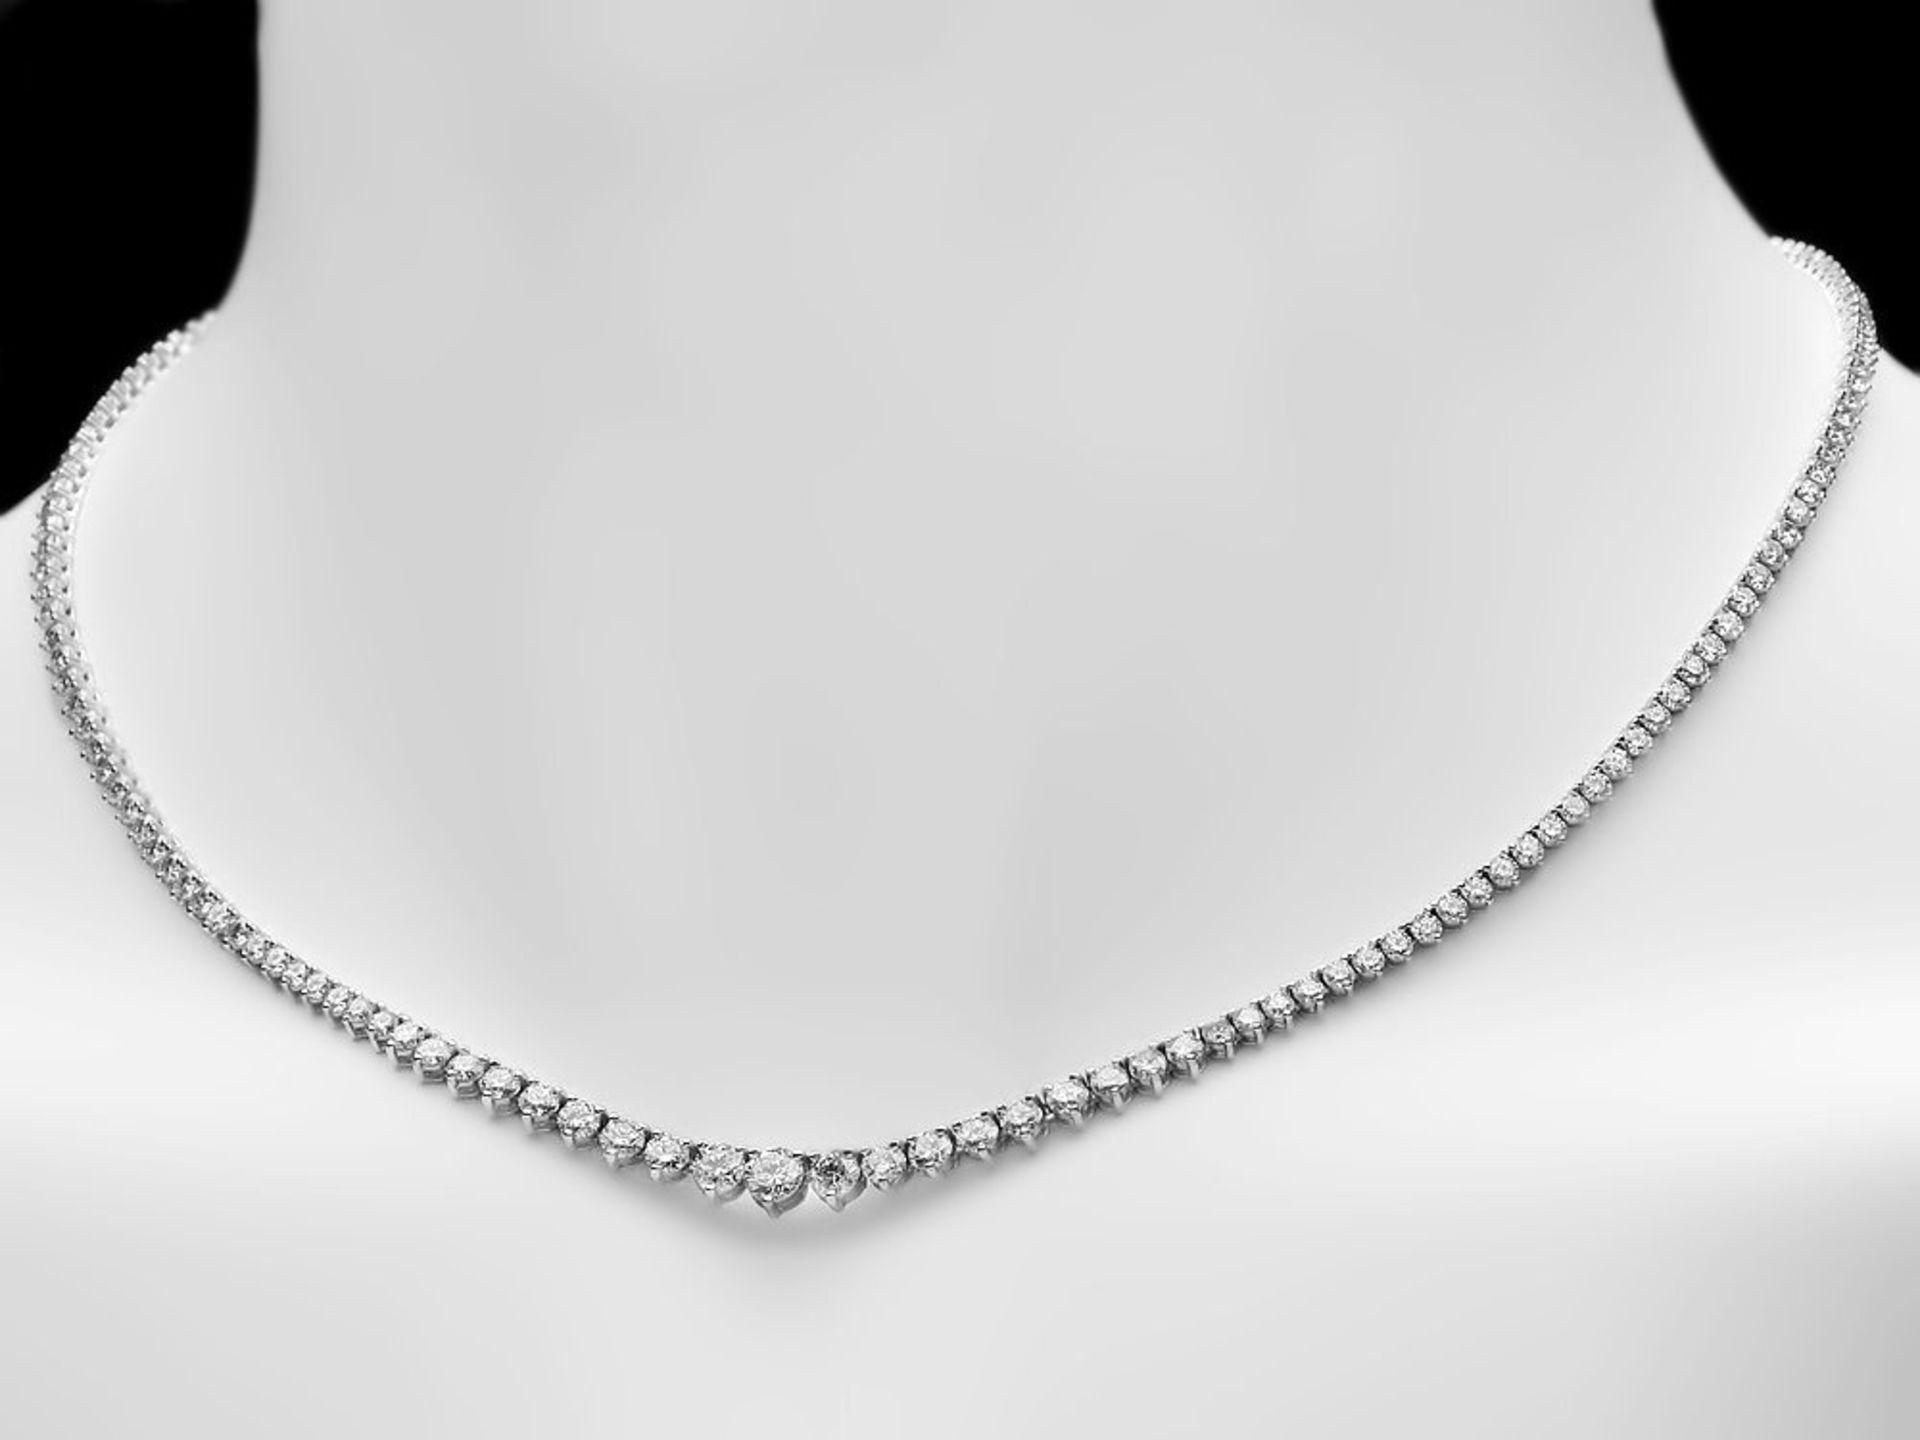 18k White Gold 9.00ct Diamond Necklace - Image 2 of 5